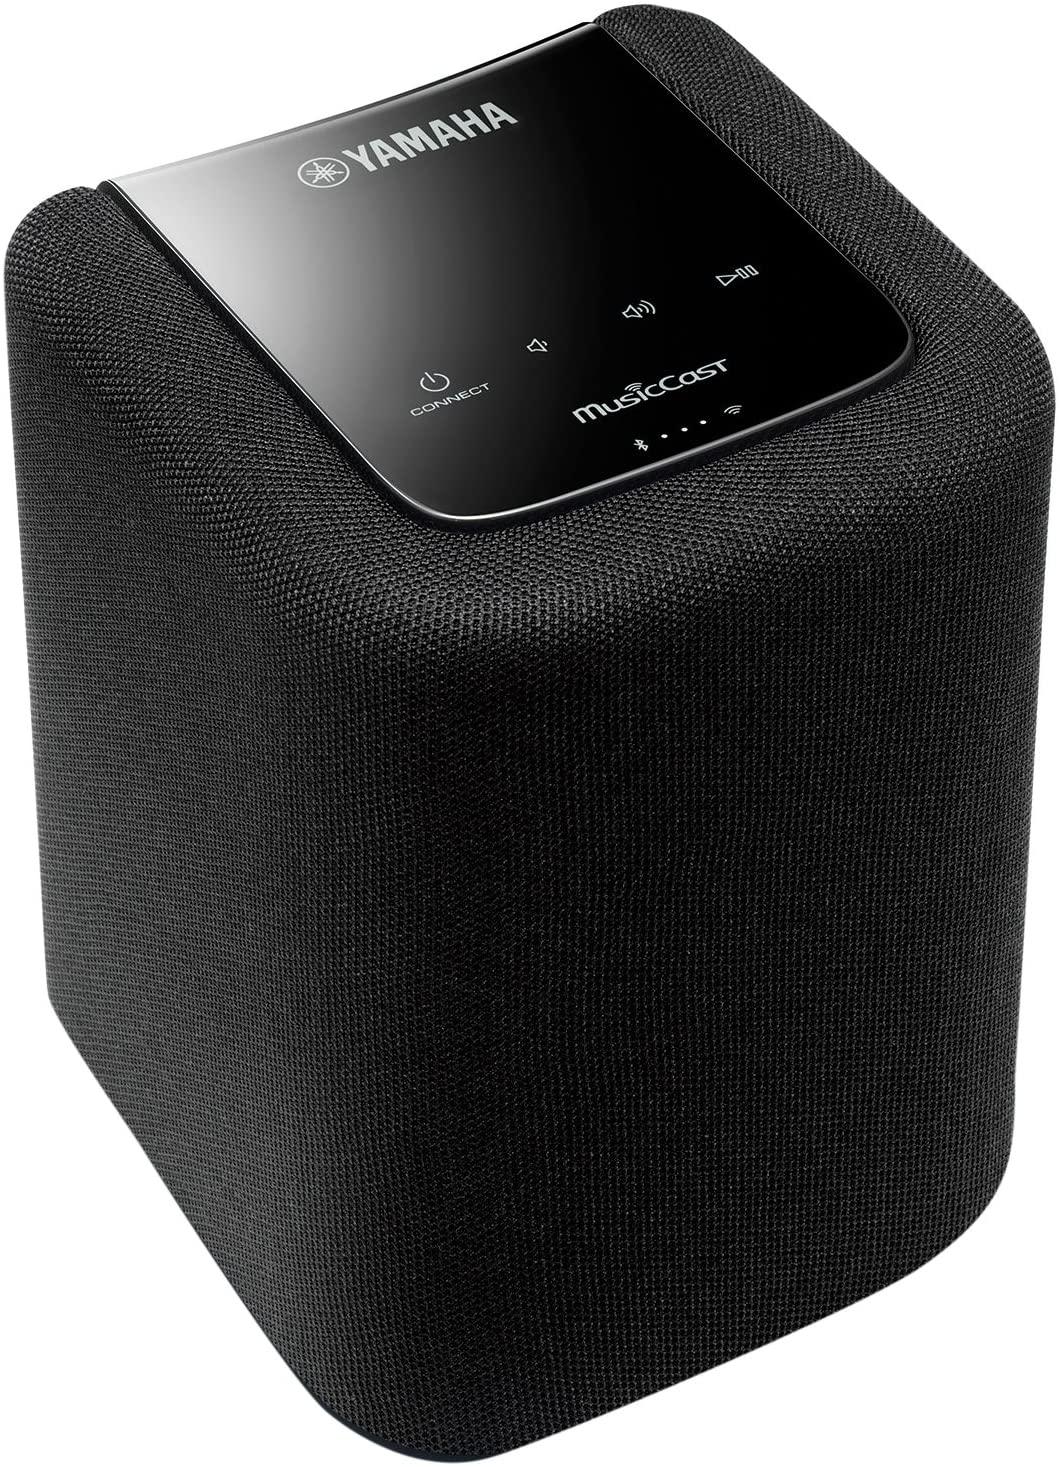 Altavoz Amplificado en Red ( WiFi, Bluetooth ) Yamaha WX-010 MusicCast